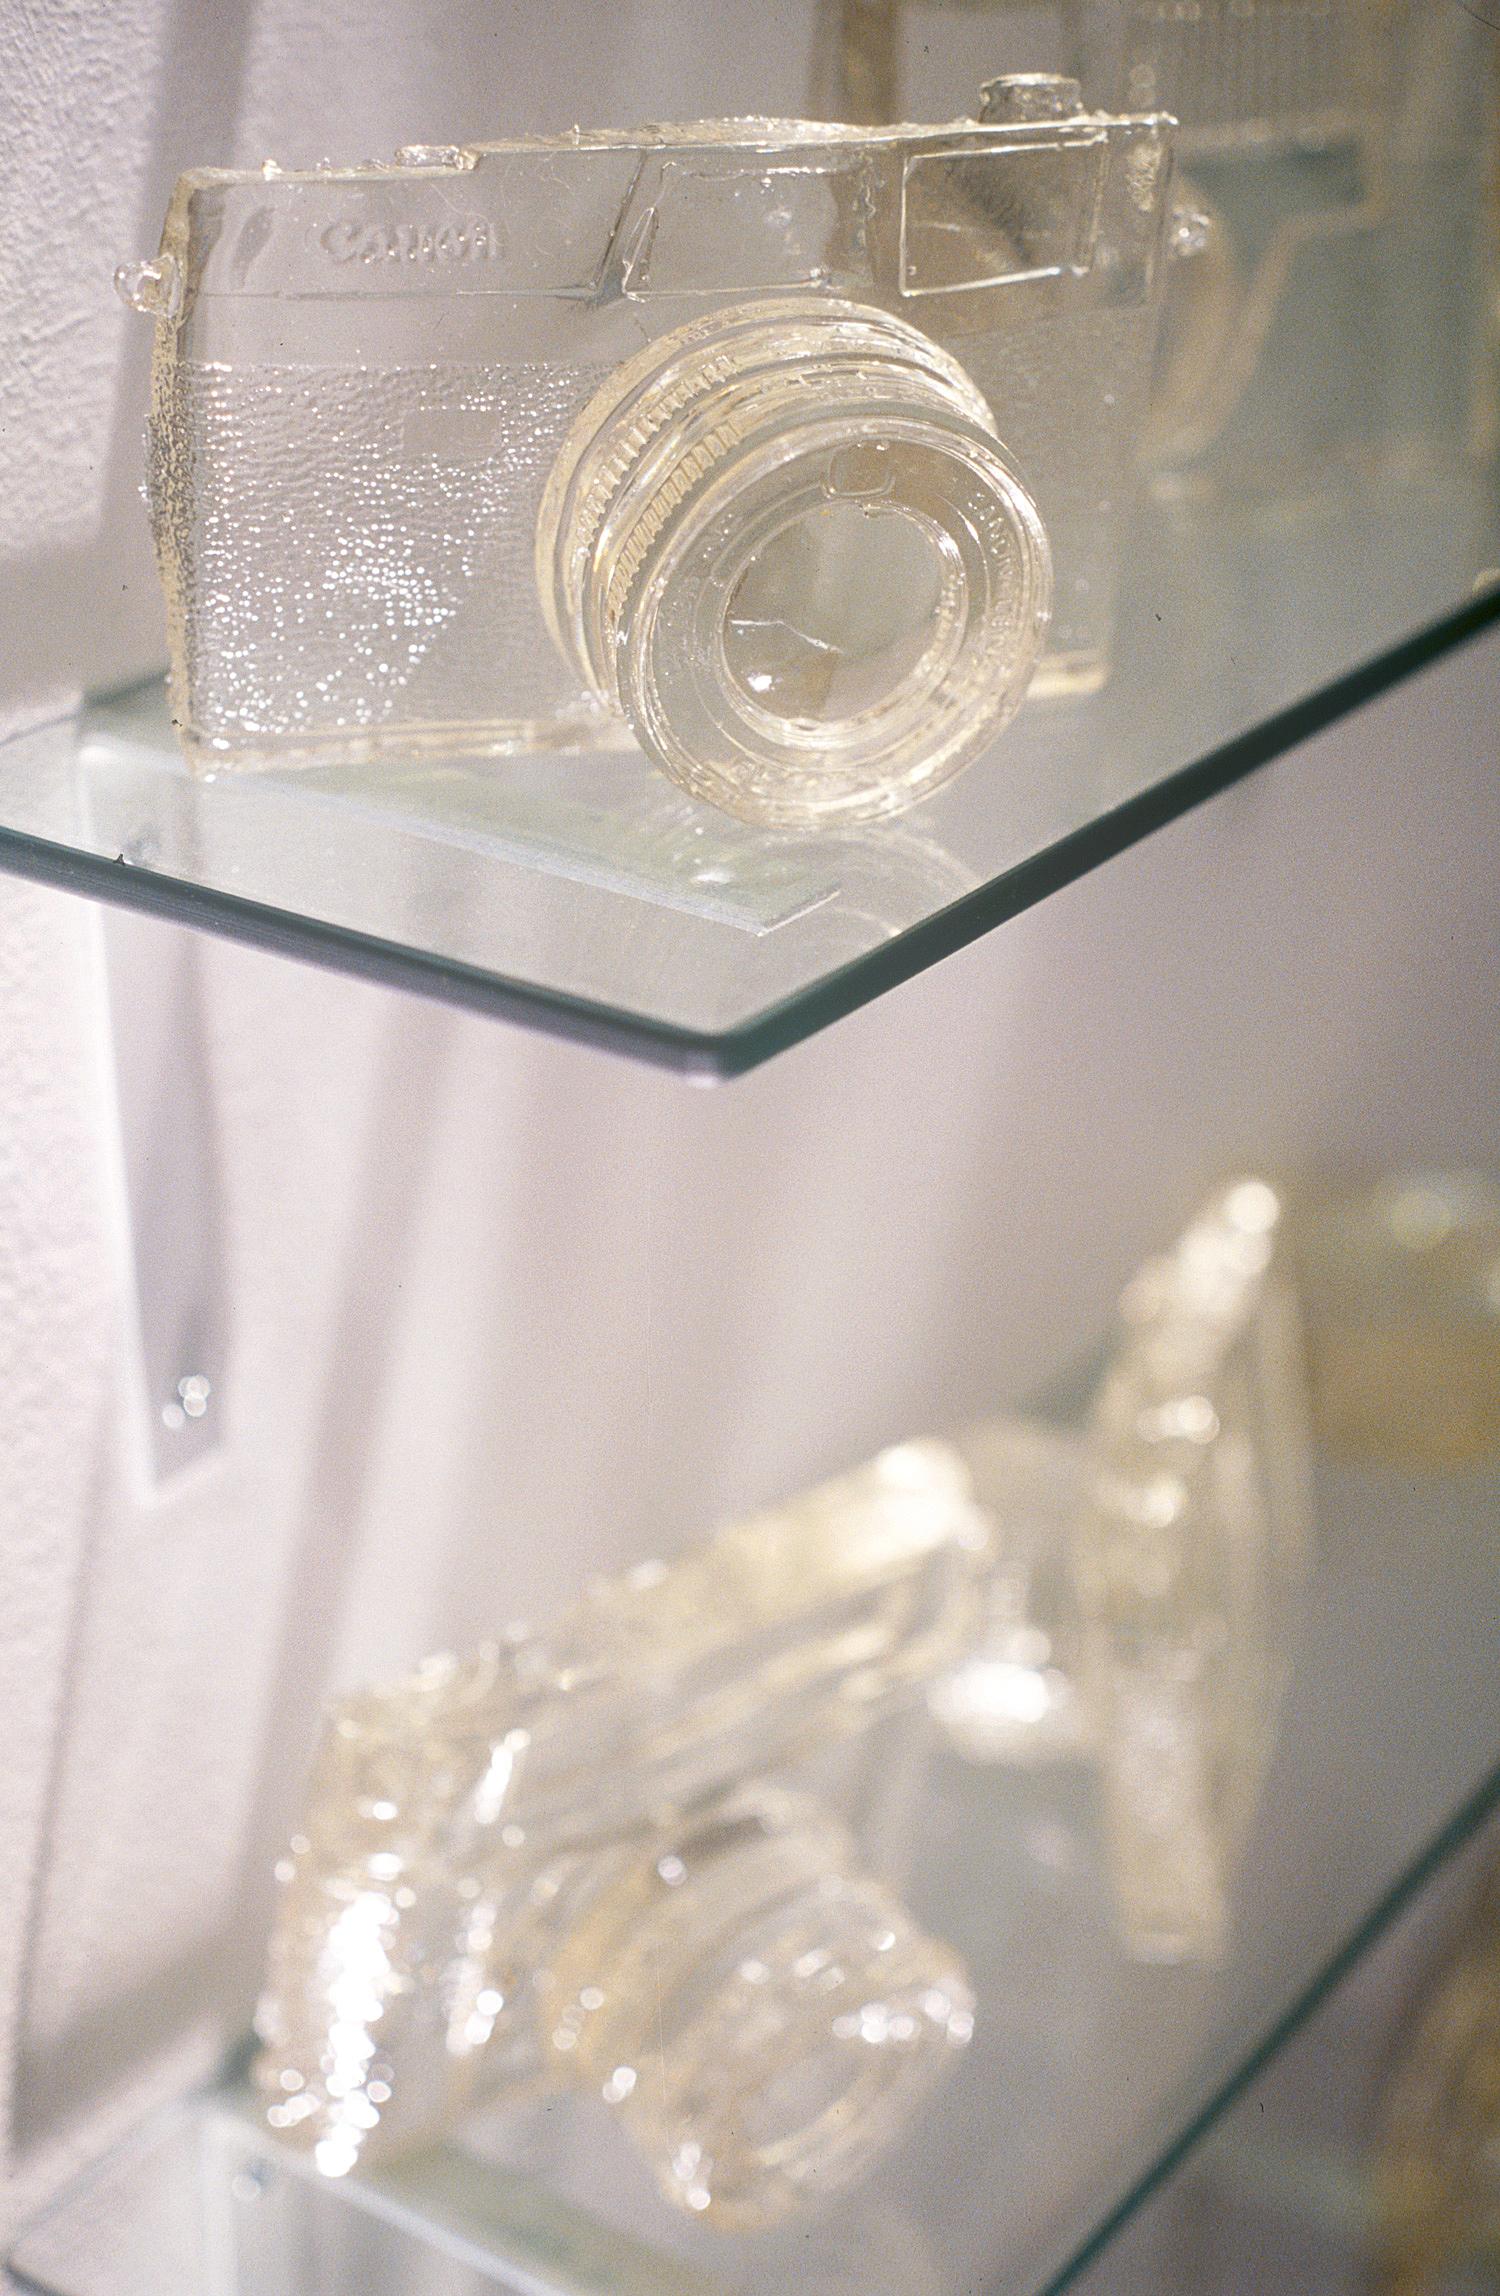 Resin cameras,Penelope Davis, 1997, installation detail, resin, glass